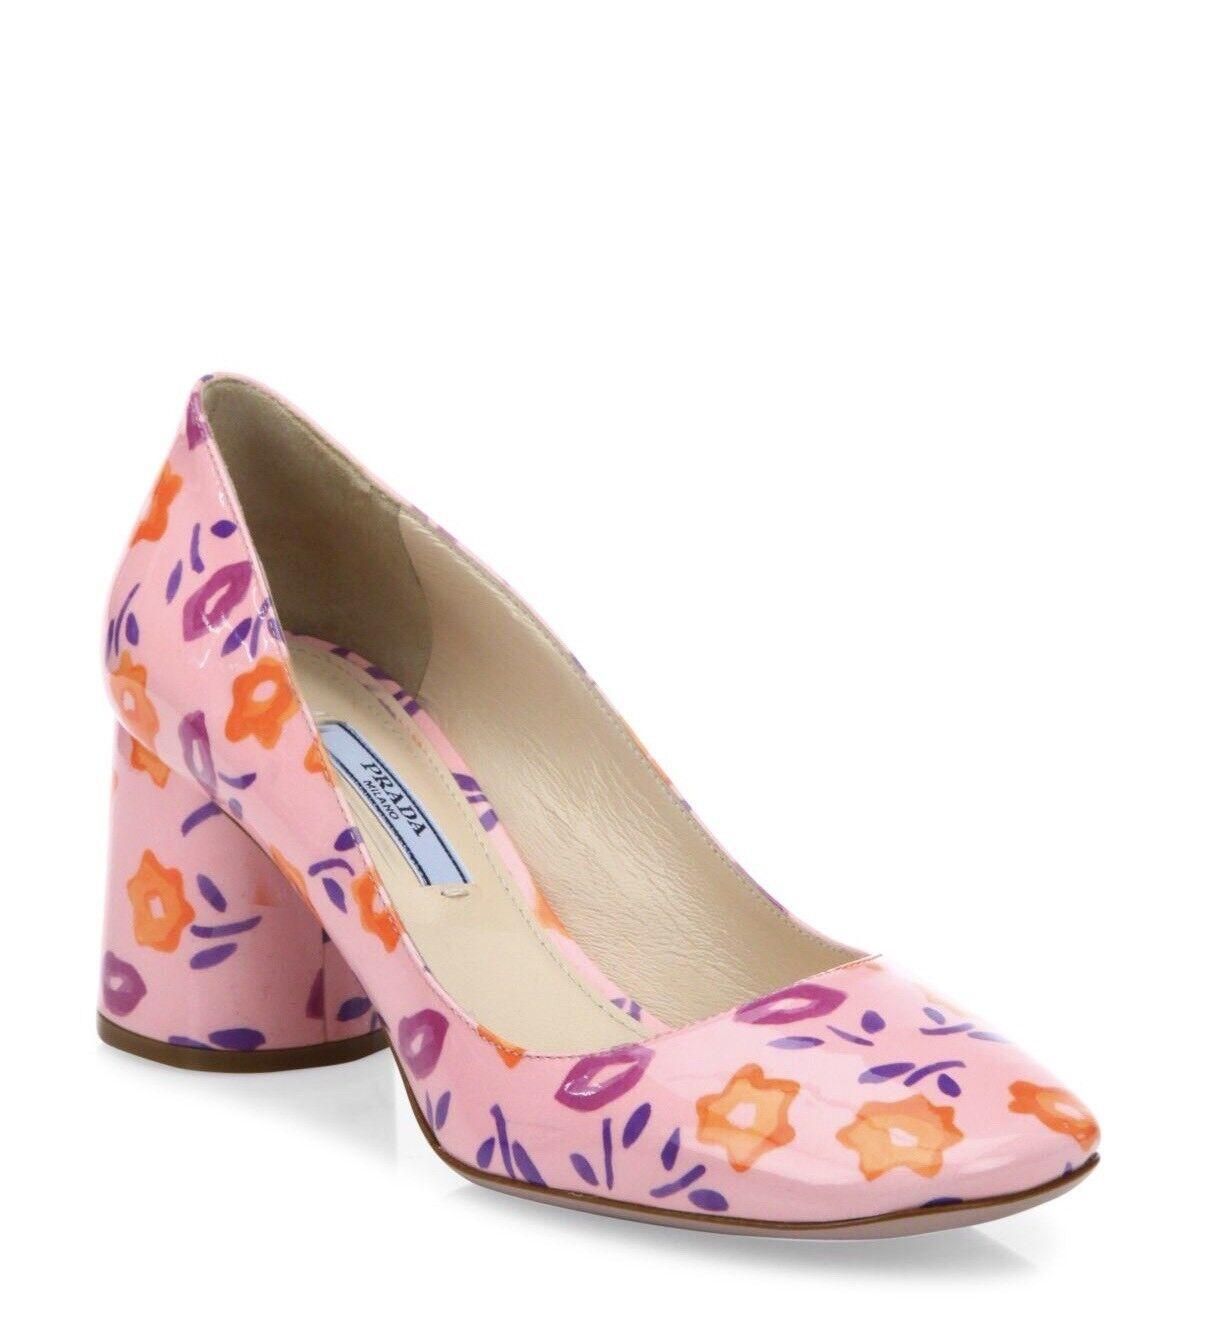 New Prada Flower-Print Pink Patent Leather Block Heel Pumps Size 40 9.5  795.00